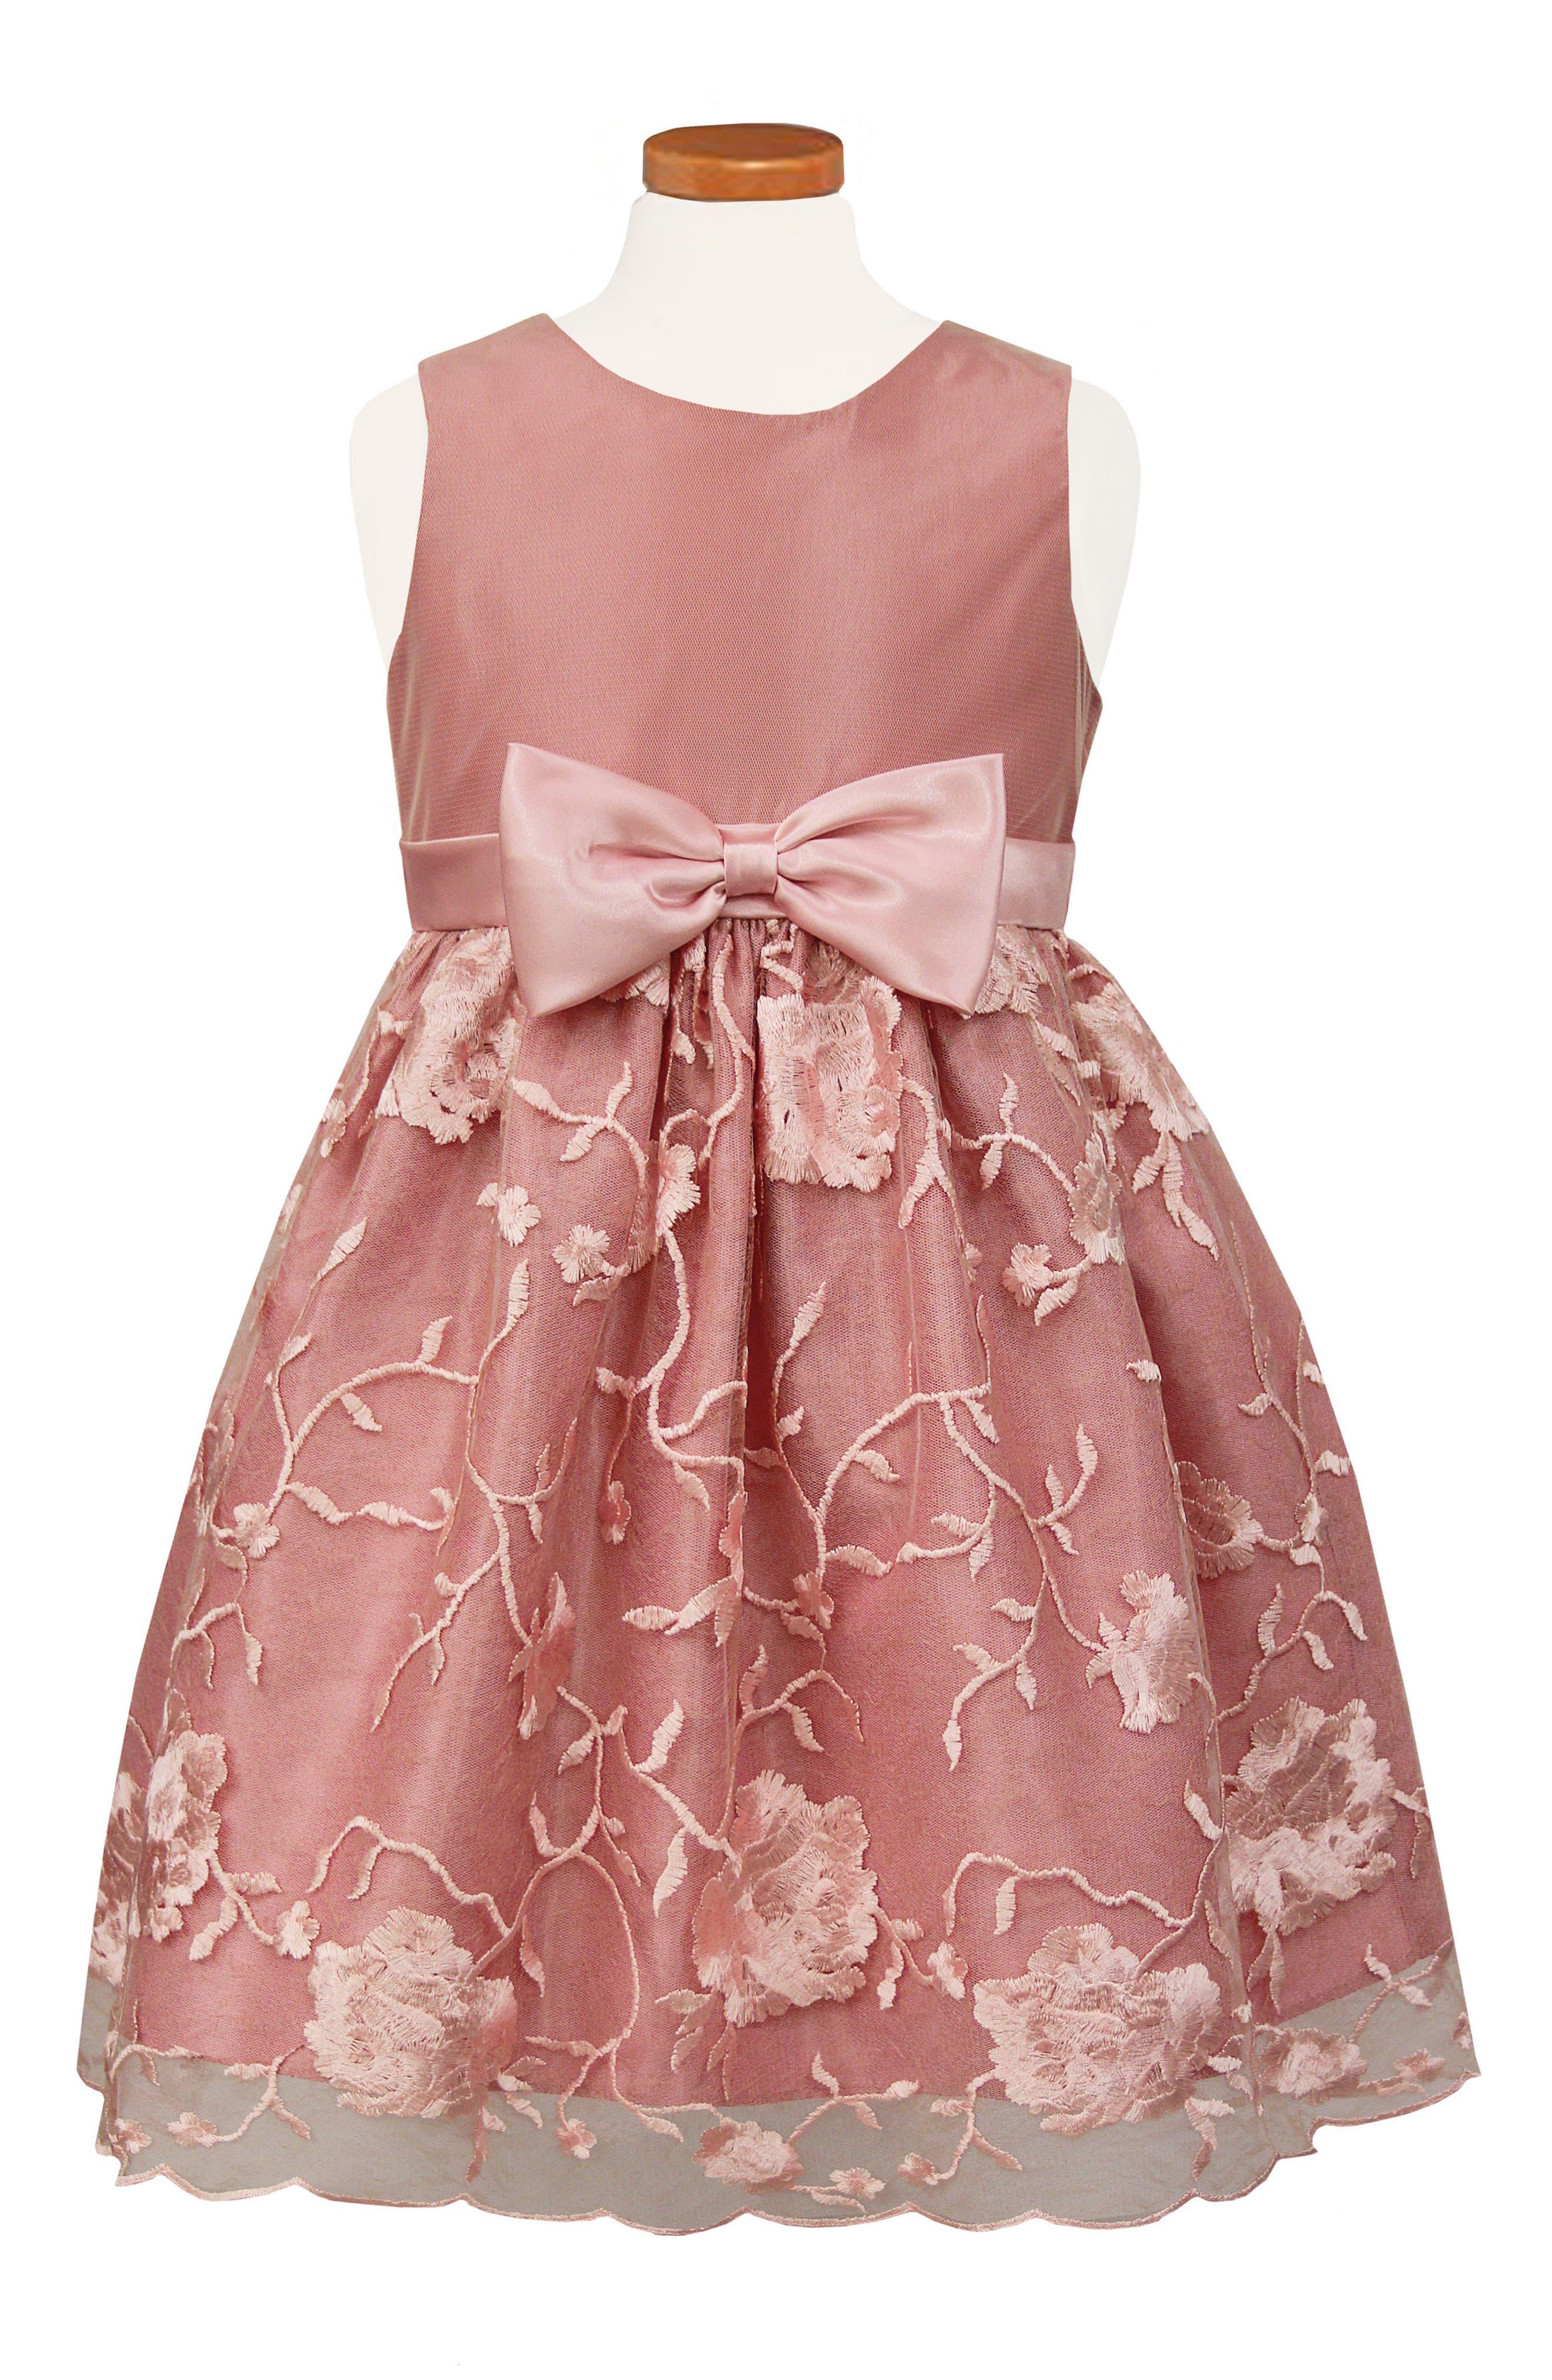 Sorbet Flower Girl Dresses & Accessories   Nordstrom